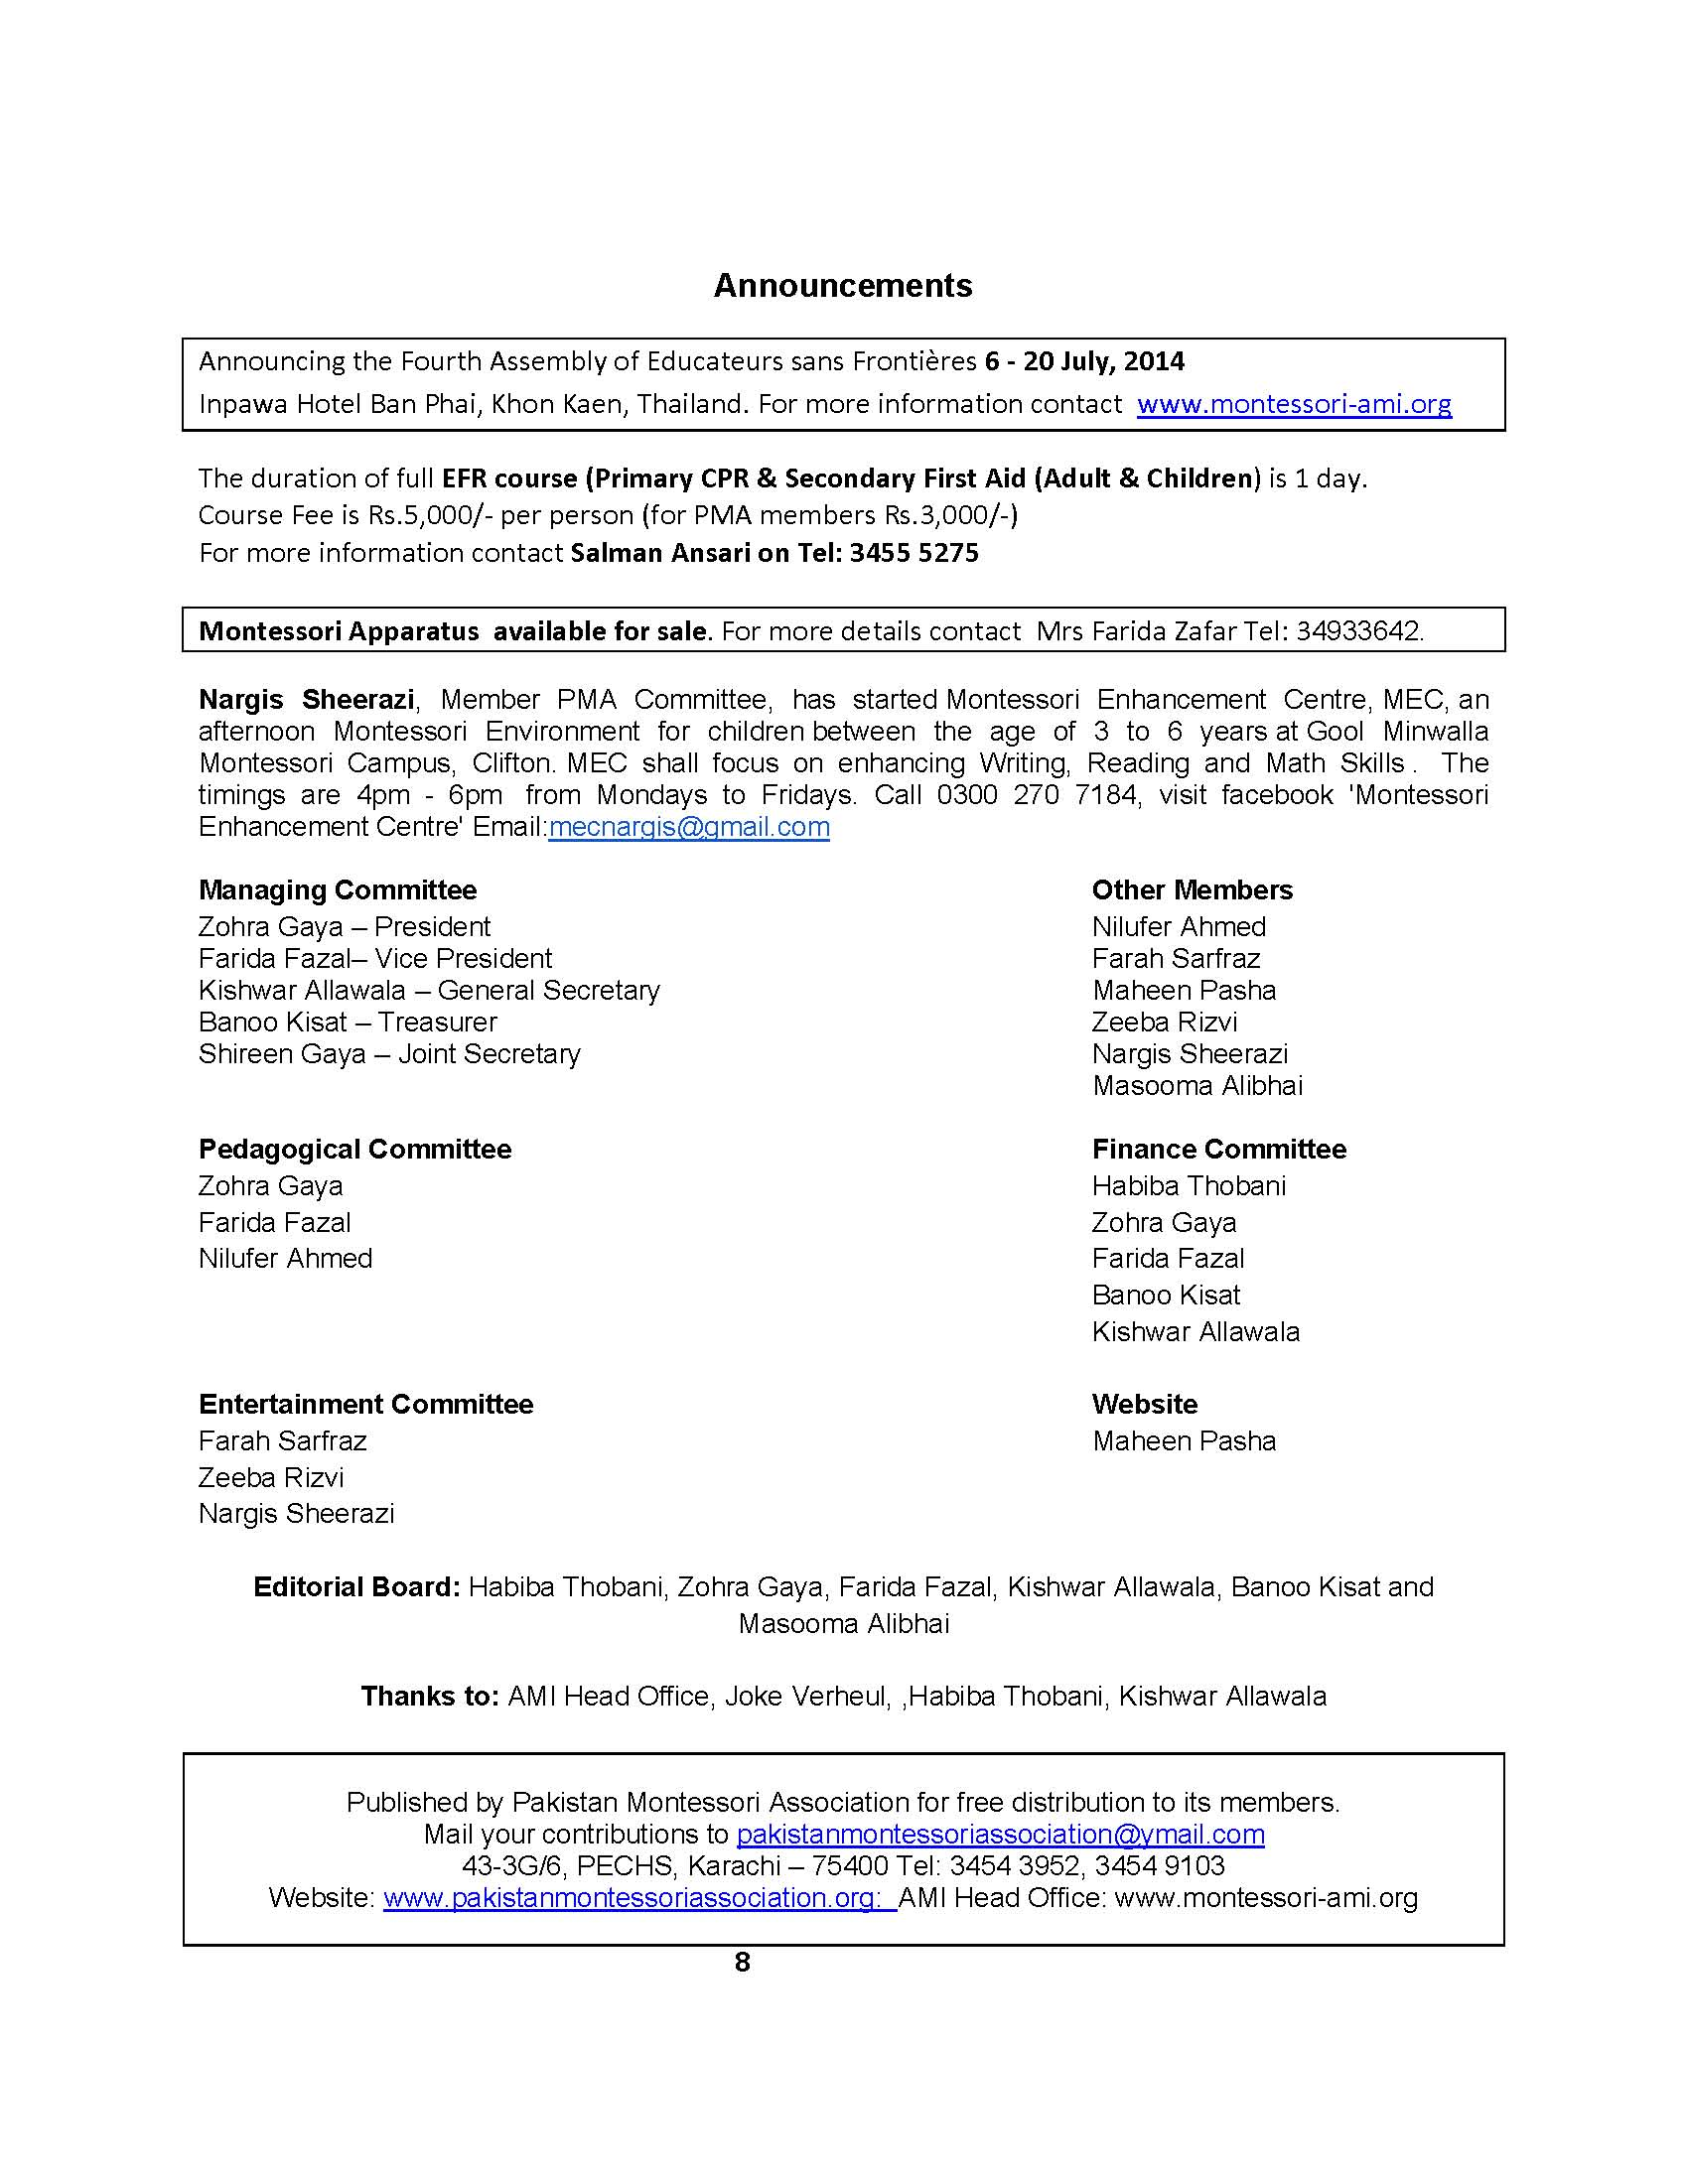 Montessorian_Jan-April_2014_Page_8